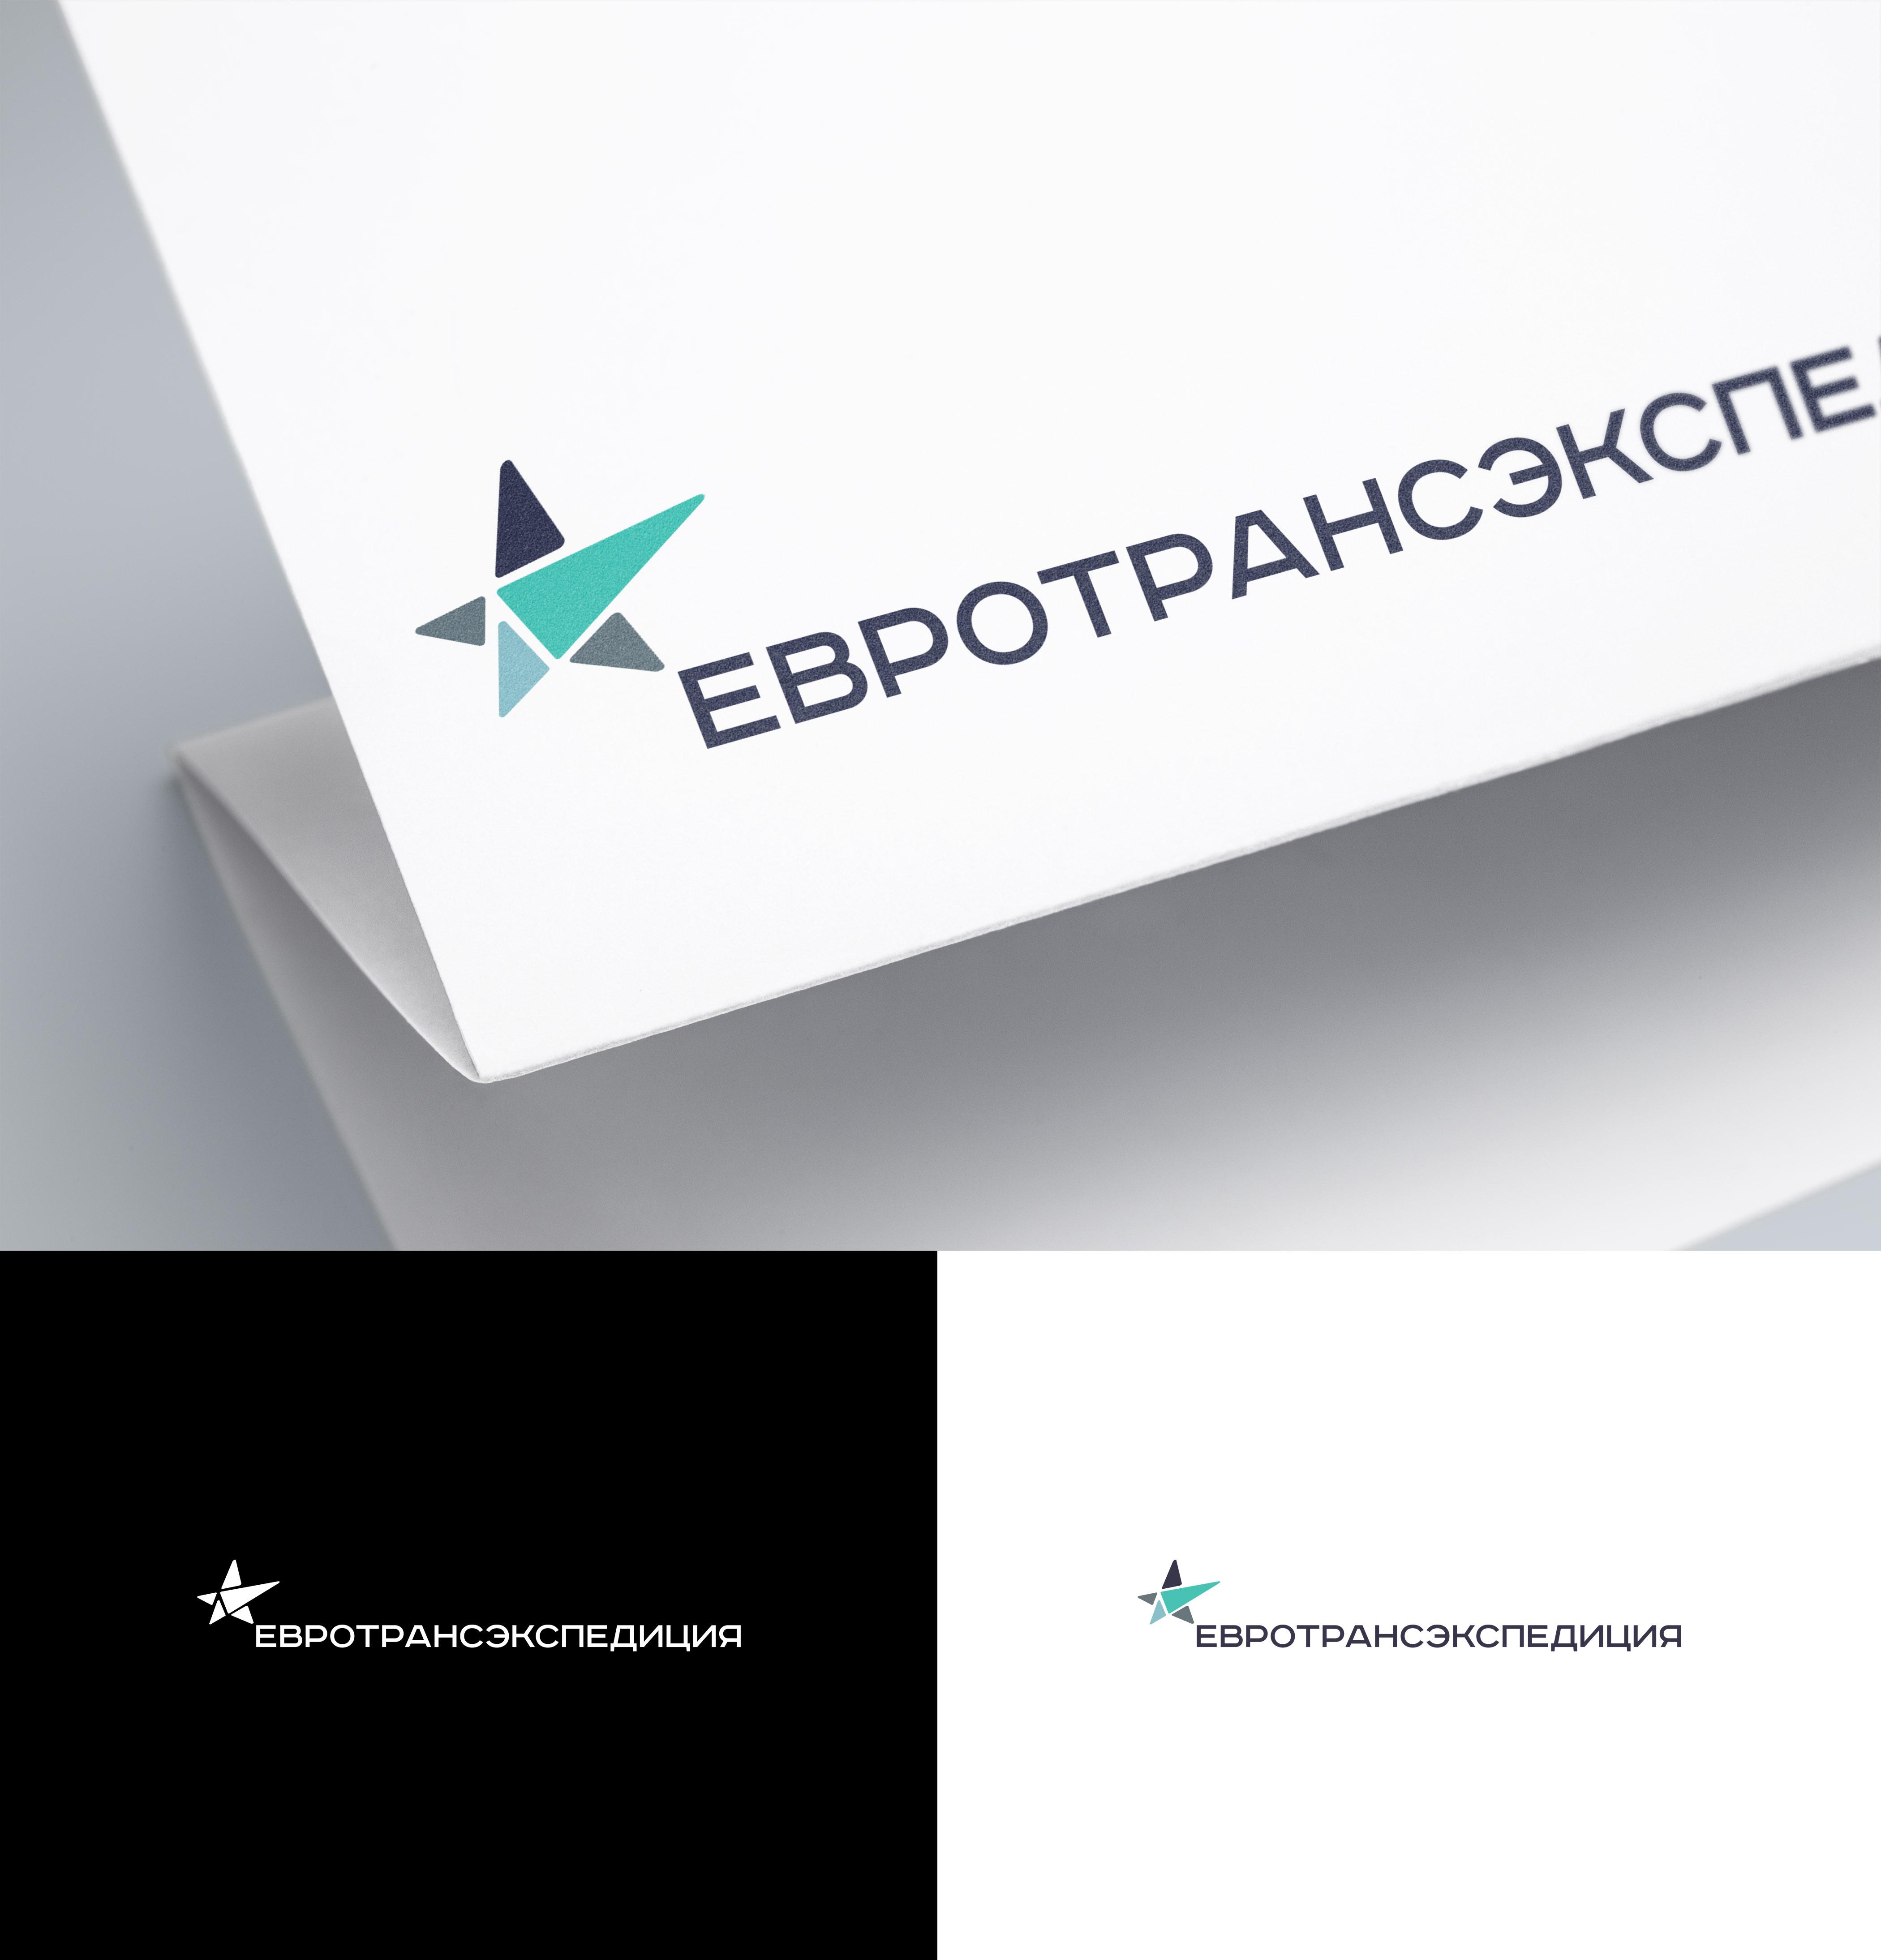 Предложите эволюцию логотипа экспедиторской компании  фото f_7565900ff93927db.jpg